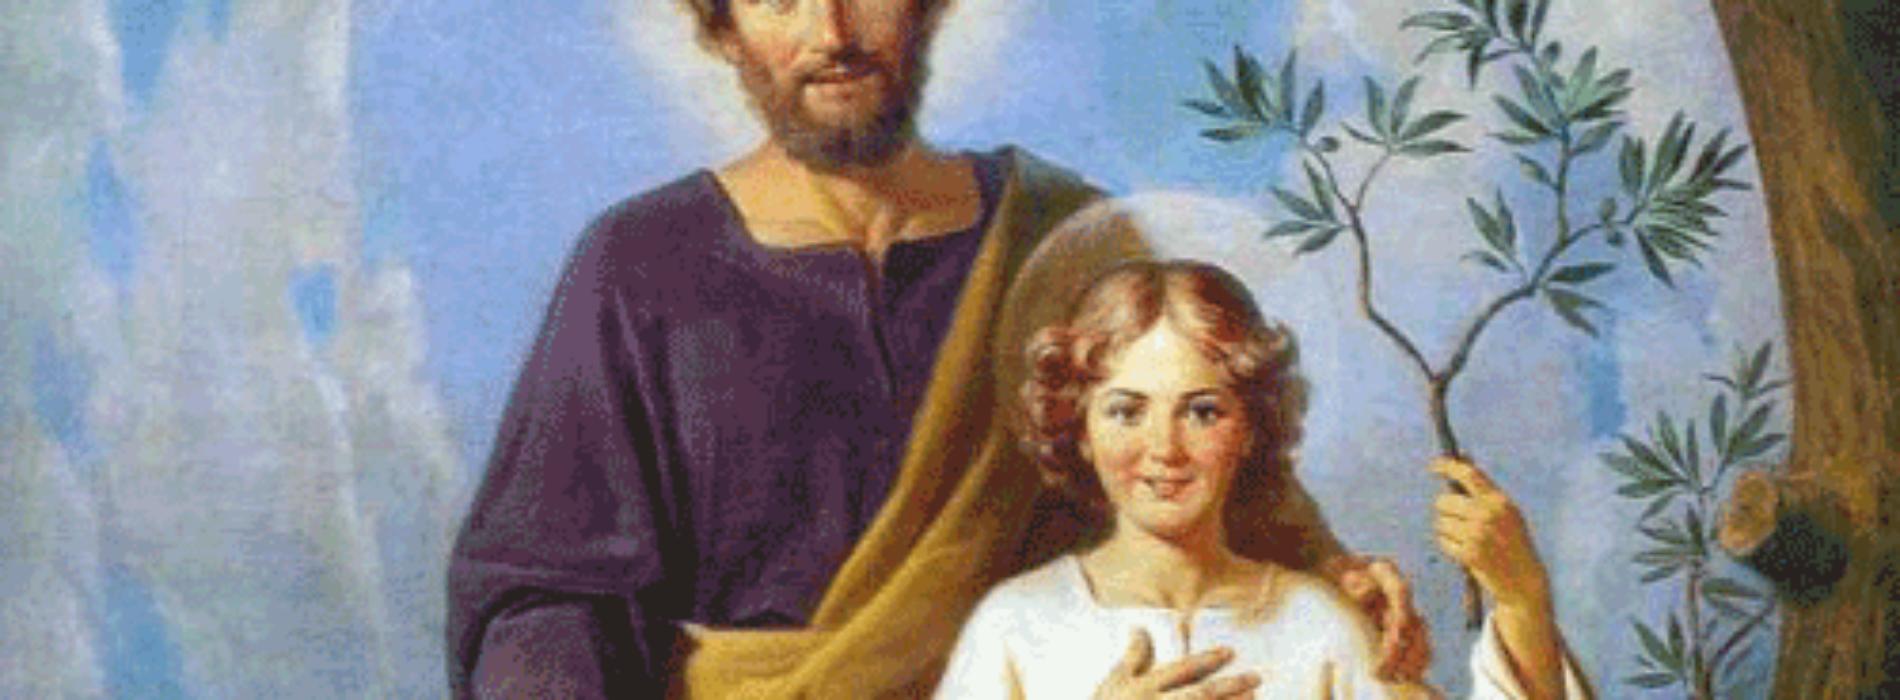 "Modi di dire napoletani:""Nun sfruculià 'a mazzarell' 'e San Giuseppe"""